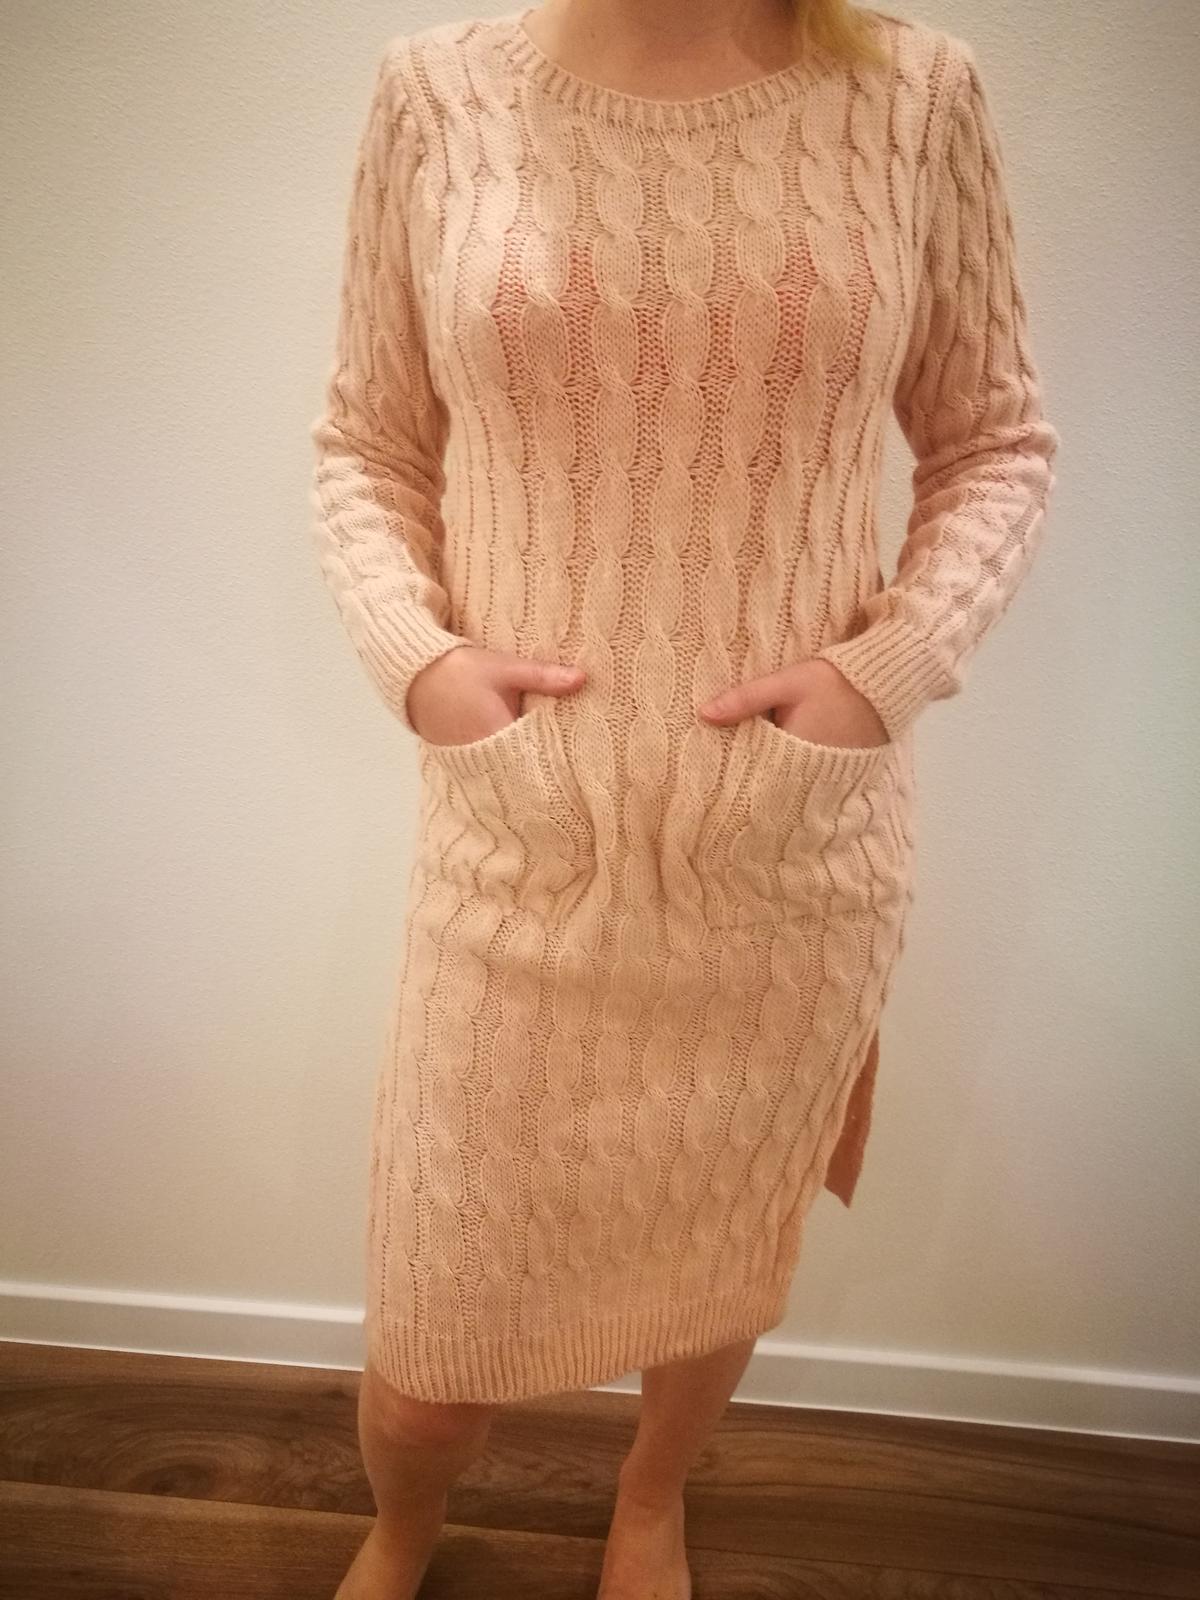 Upletove šaty - Obrázok č. 1